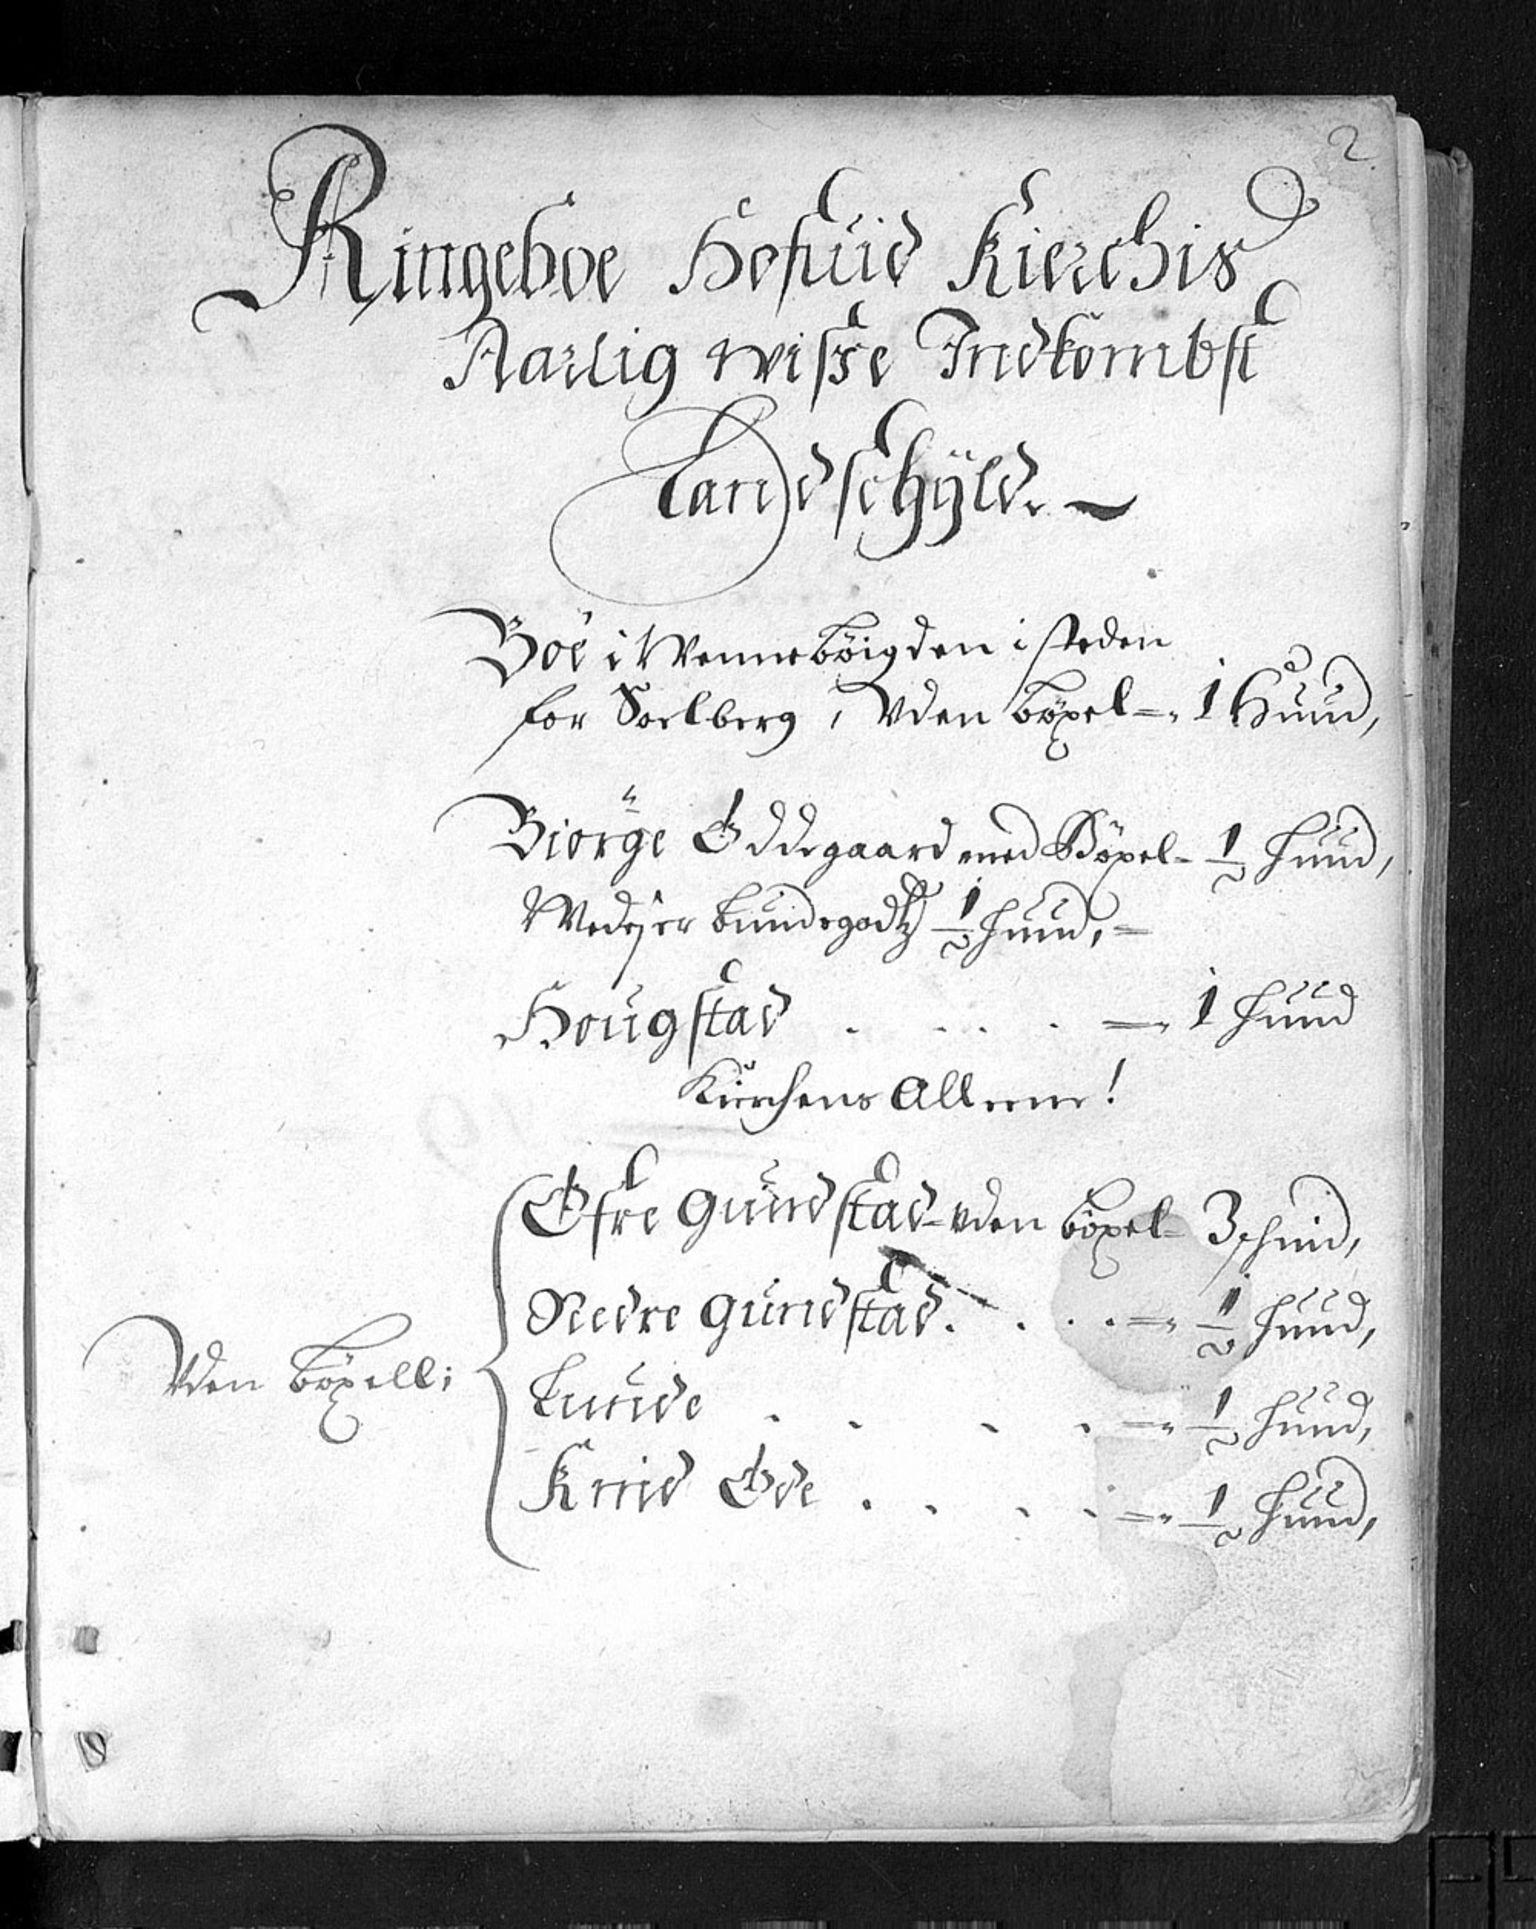 SAH, Kirkestoler i Oppland fylke, F/Fa/Fae/L0001: Kirkestol for Ringebu, 1682-1722